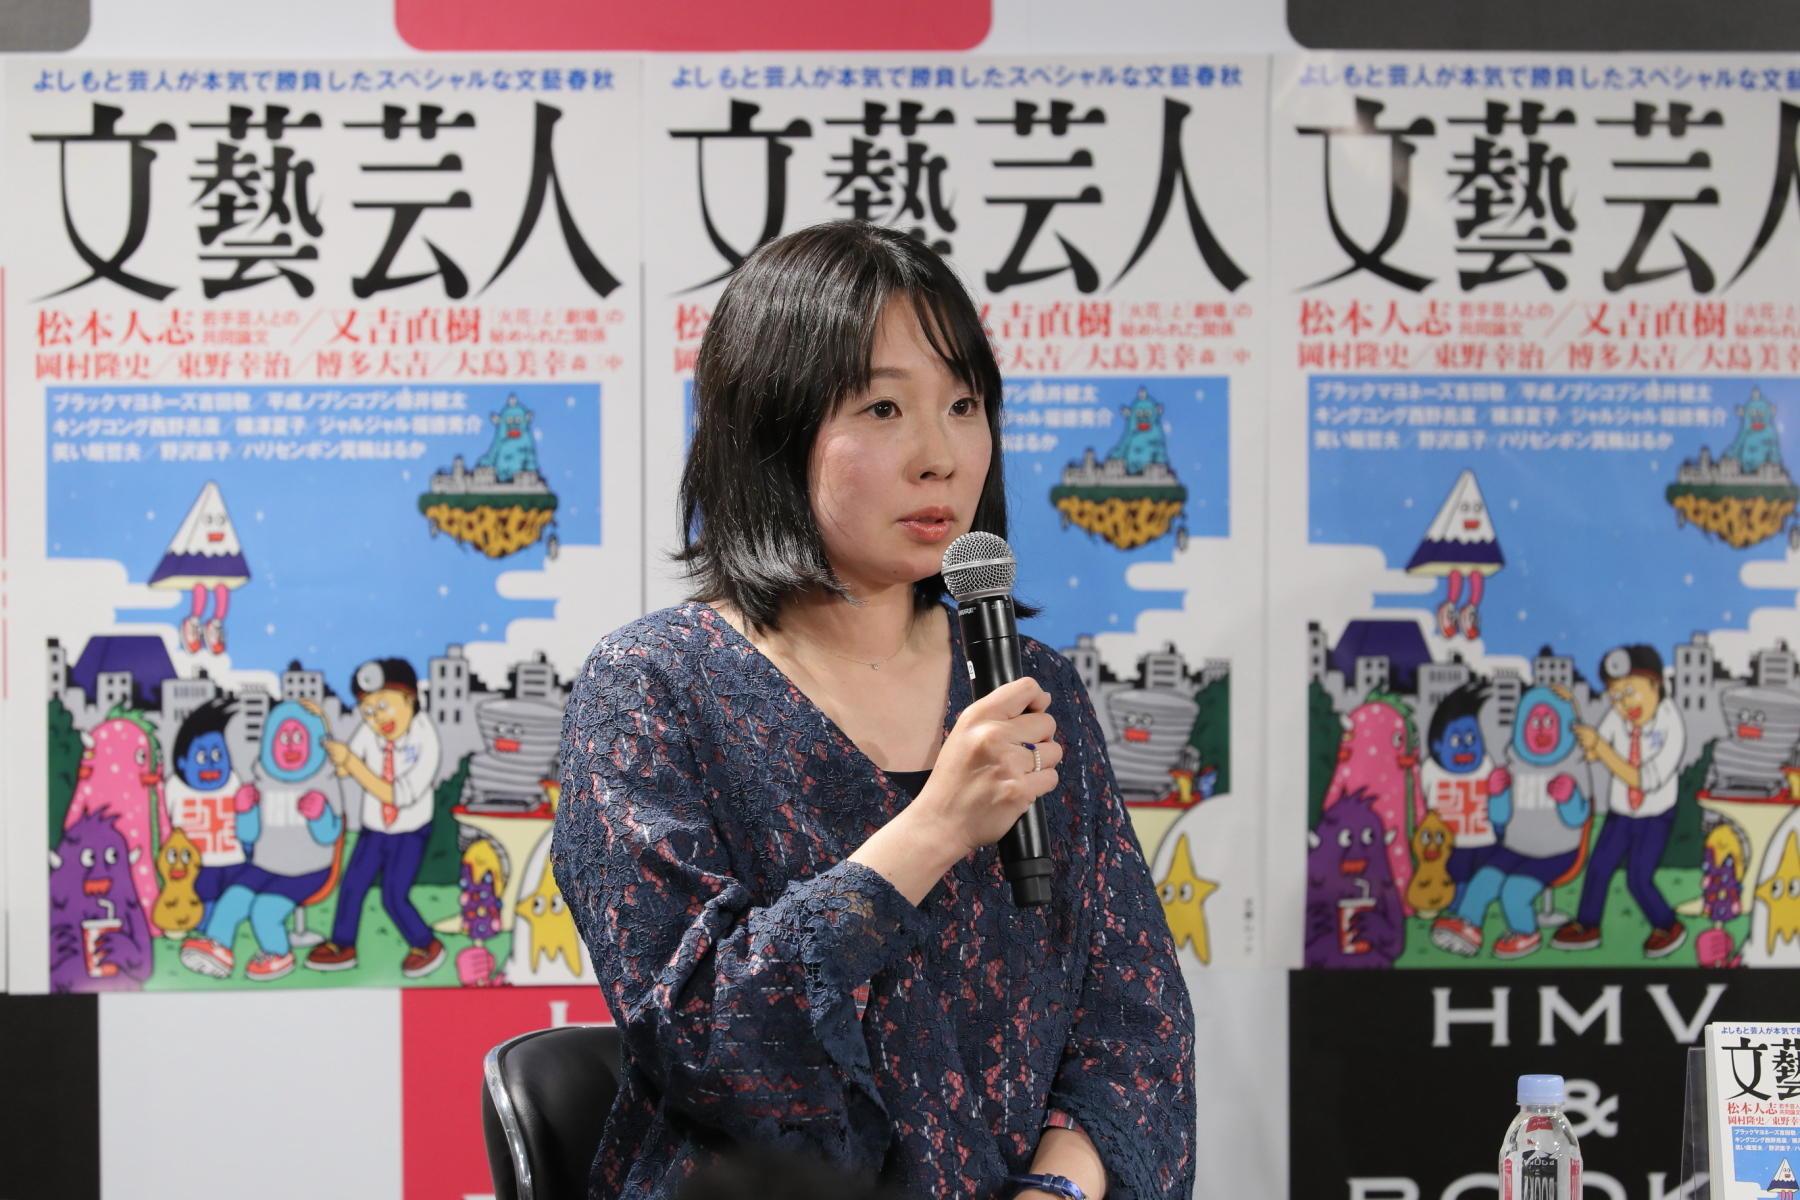 http://news.yoshimoto.co.jp/20170330195224-79780b95e9824c580261e920a4facc80fe550aeb.jpg